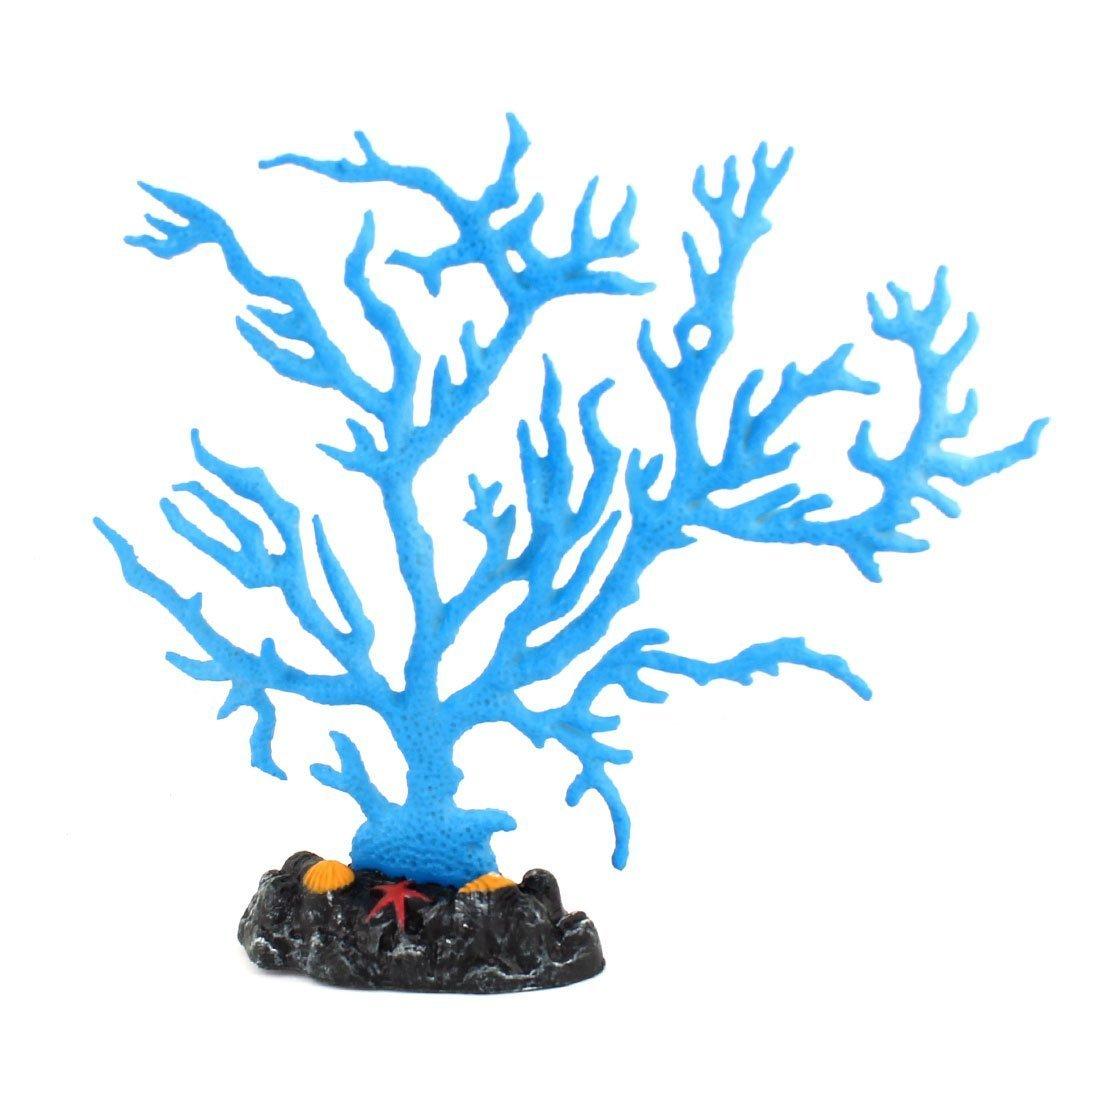 1Pc Aquarium Artificial Glowing Rockery Coral Plant Decoration Dodger bluee